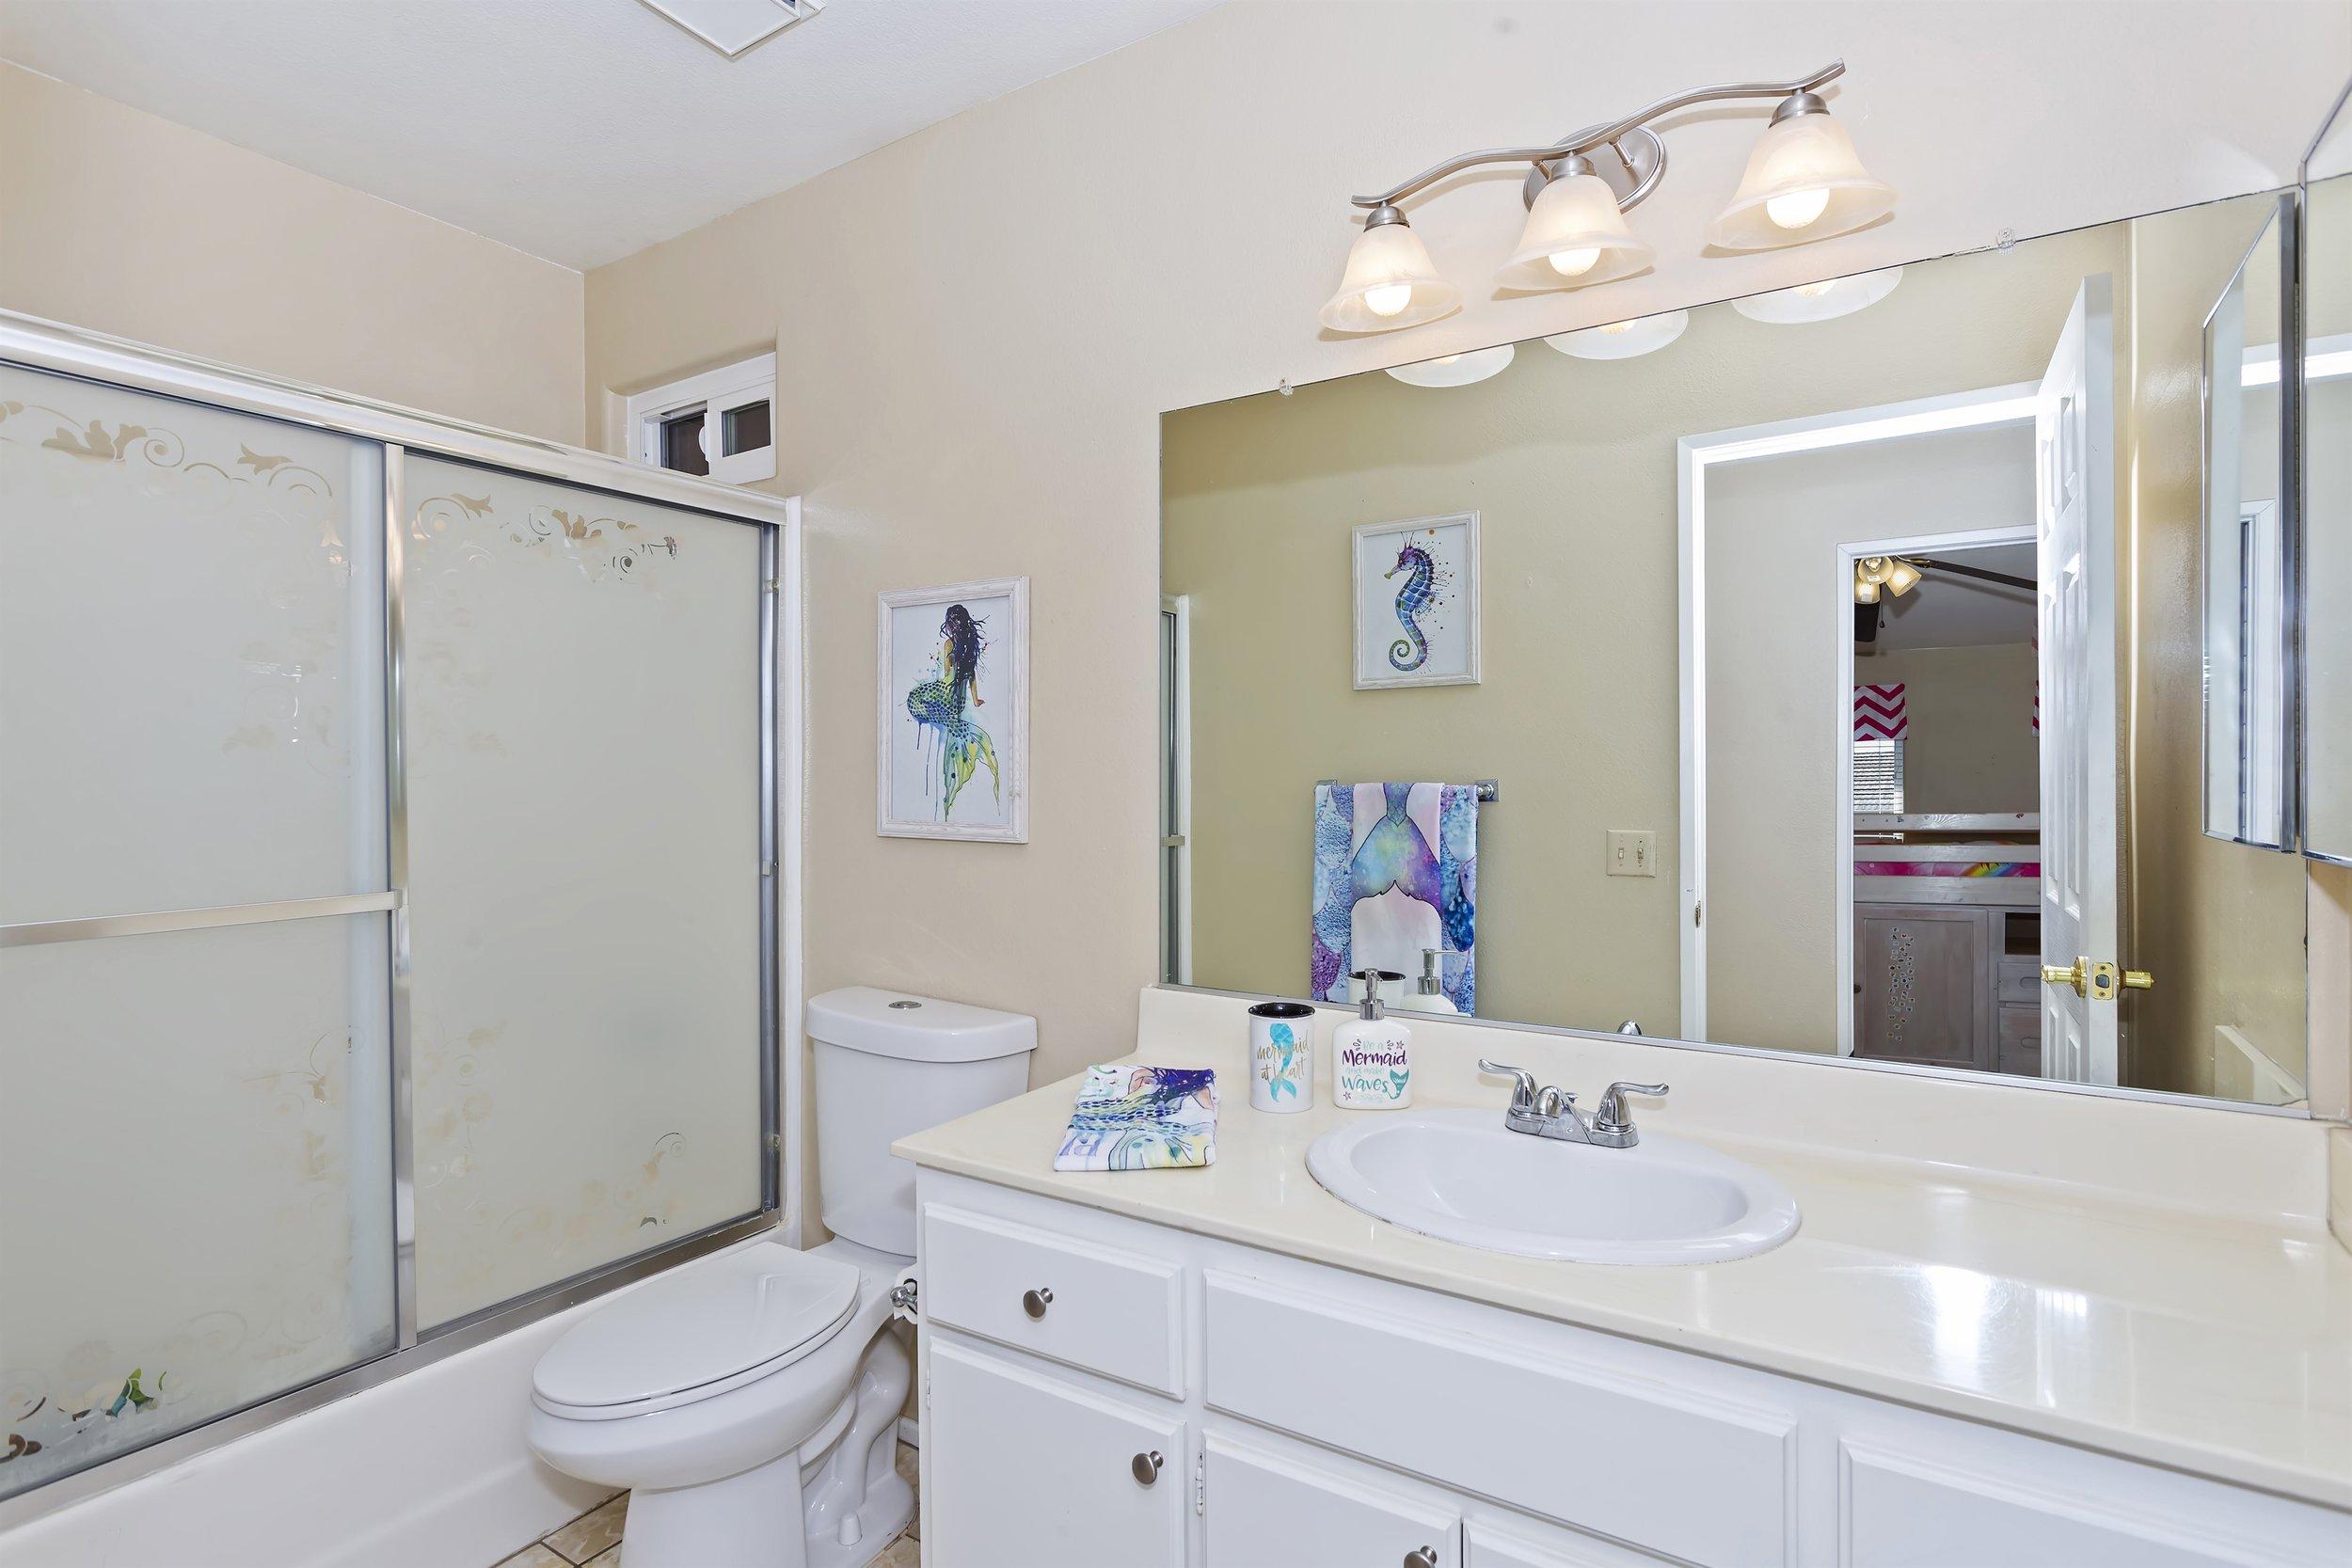 025_2nd Floor Bathroom.jpg